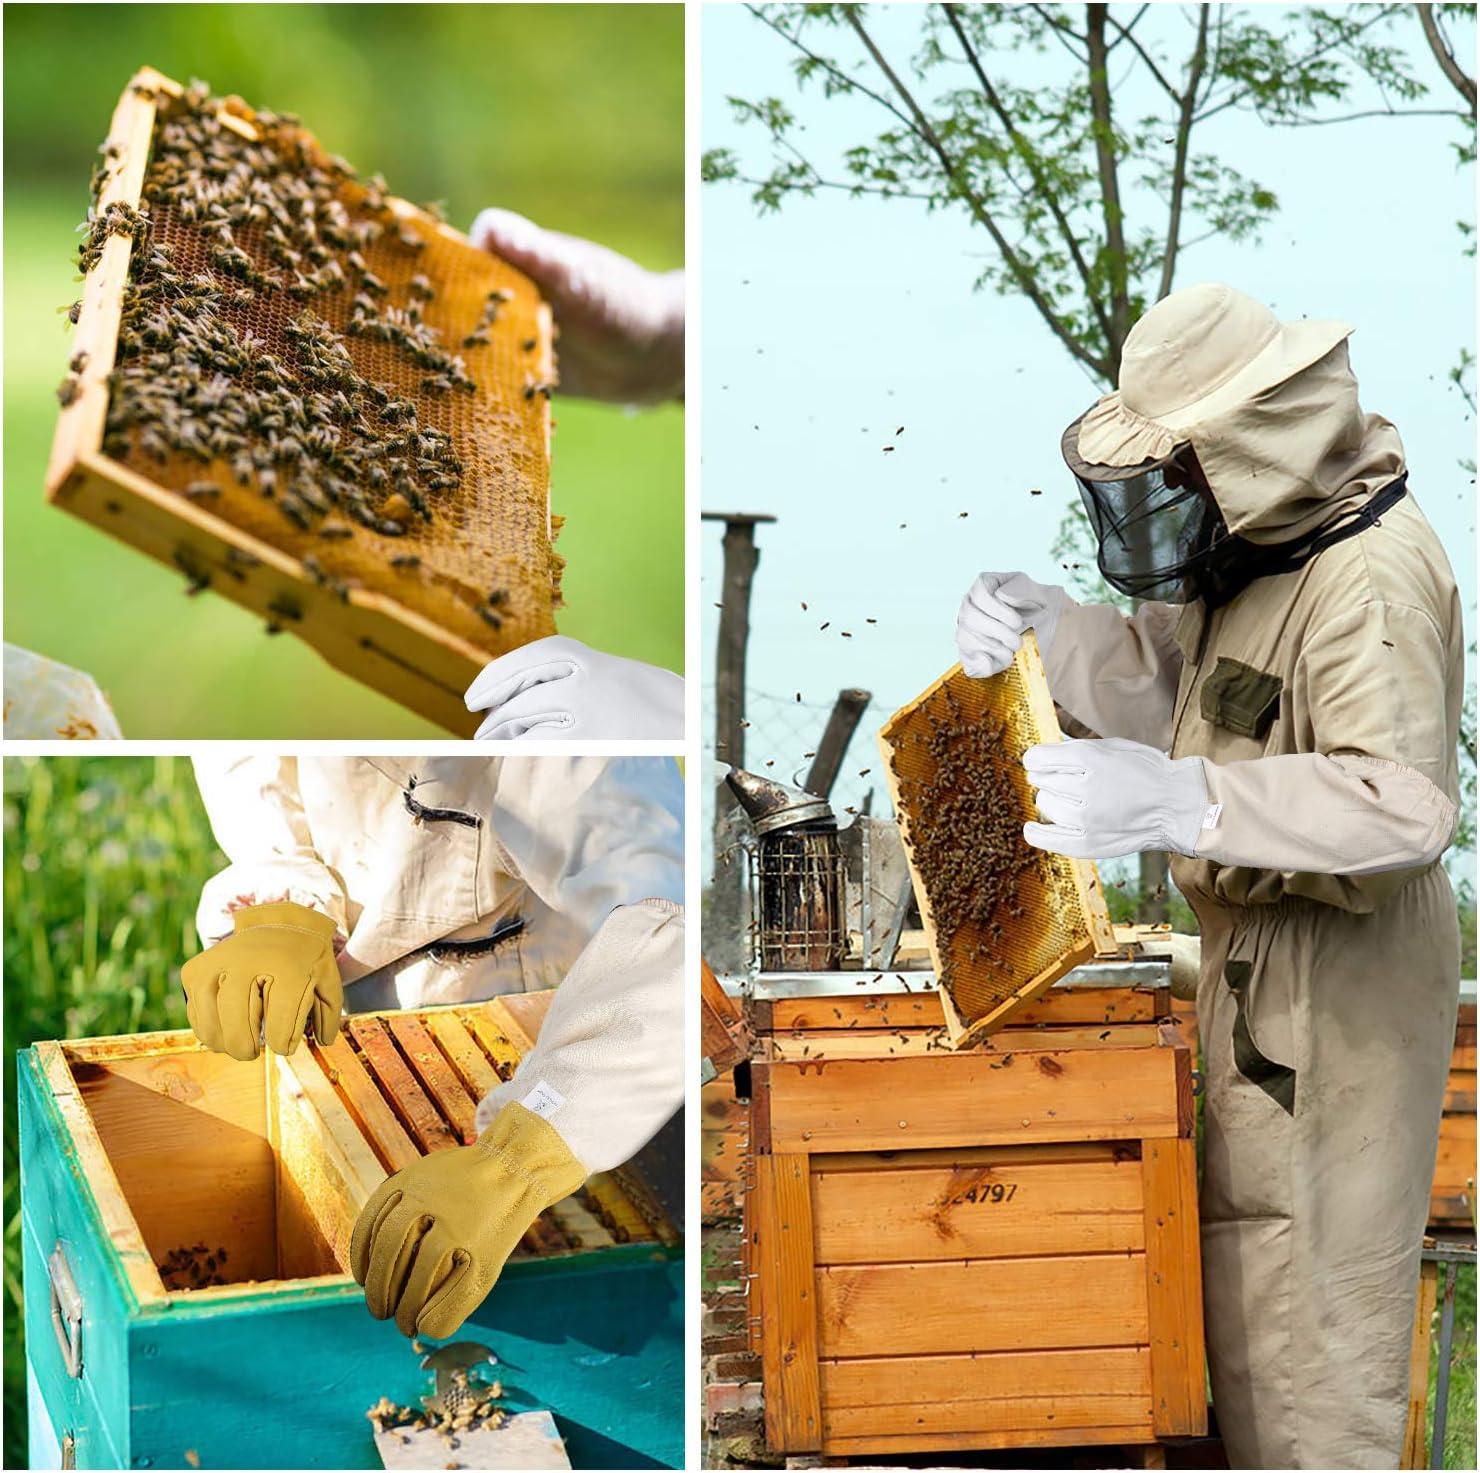 Guantes de Apicultor cjixnji Guantes de protecci/ón para Apicultura pu/ños ventilados Piel de Cabra Transpirables Guantes de protecci/ón para apicultores Impermeables